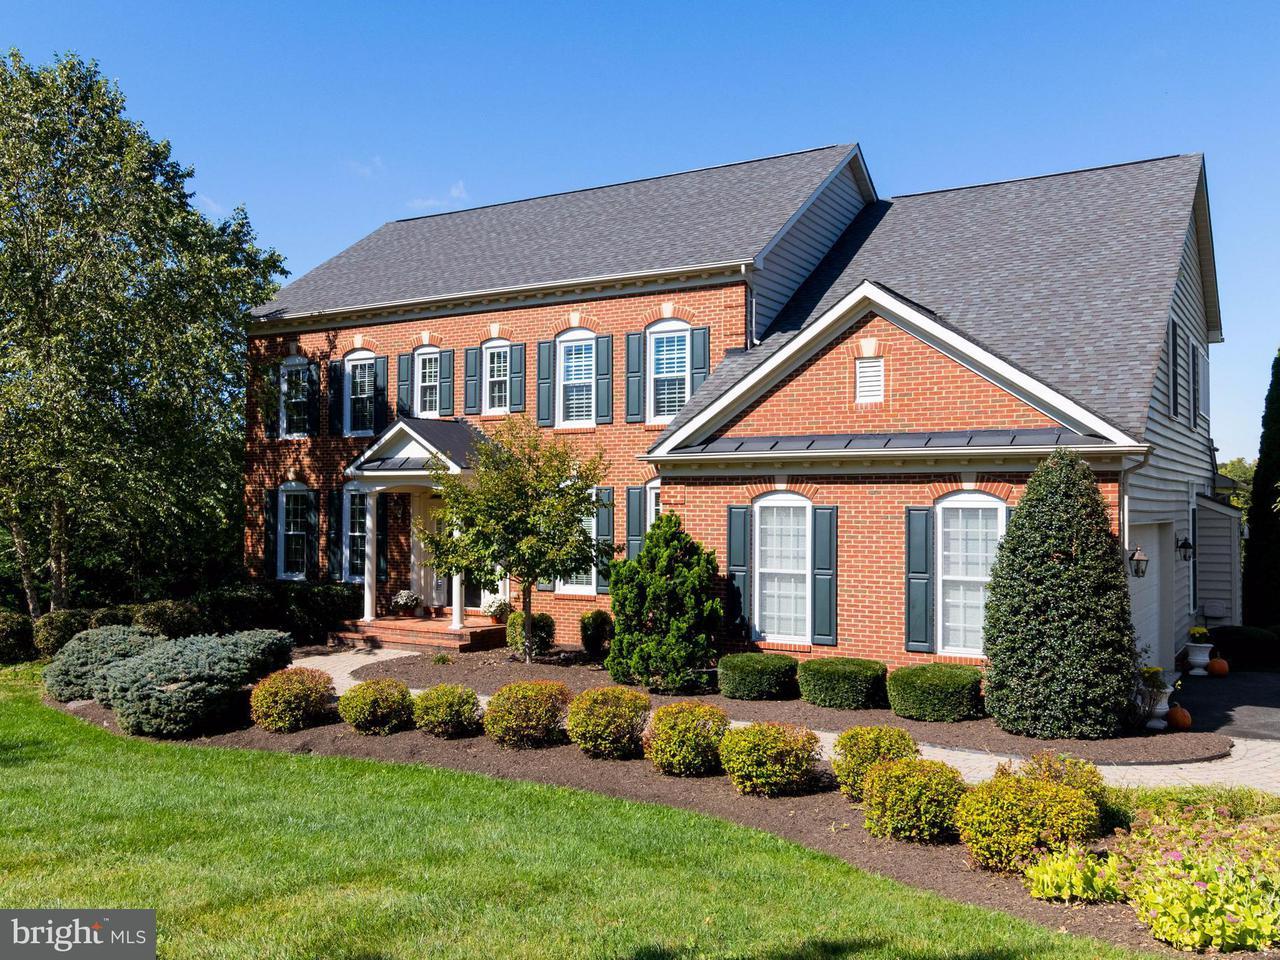 独户住宅 为 销售 在 19212 SHANDALL Court 19212 SHANDALL Court Parkton, 马里兰州 21120 美国